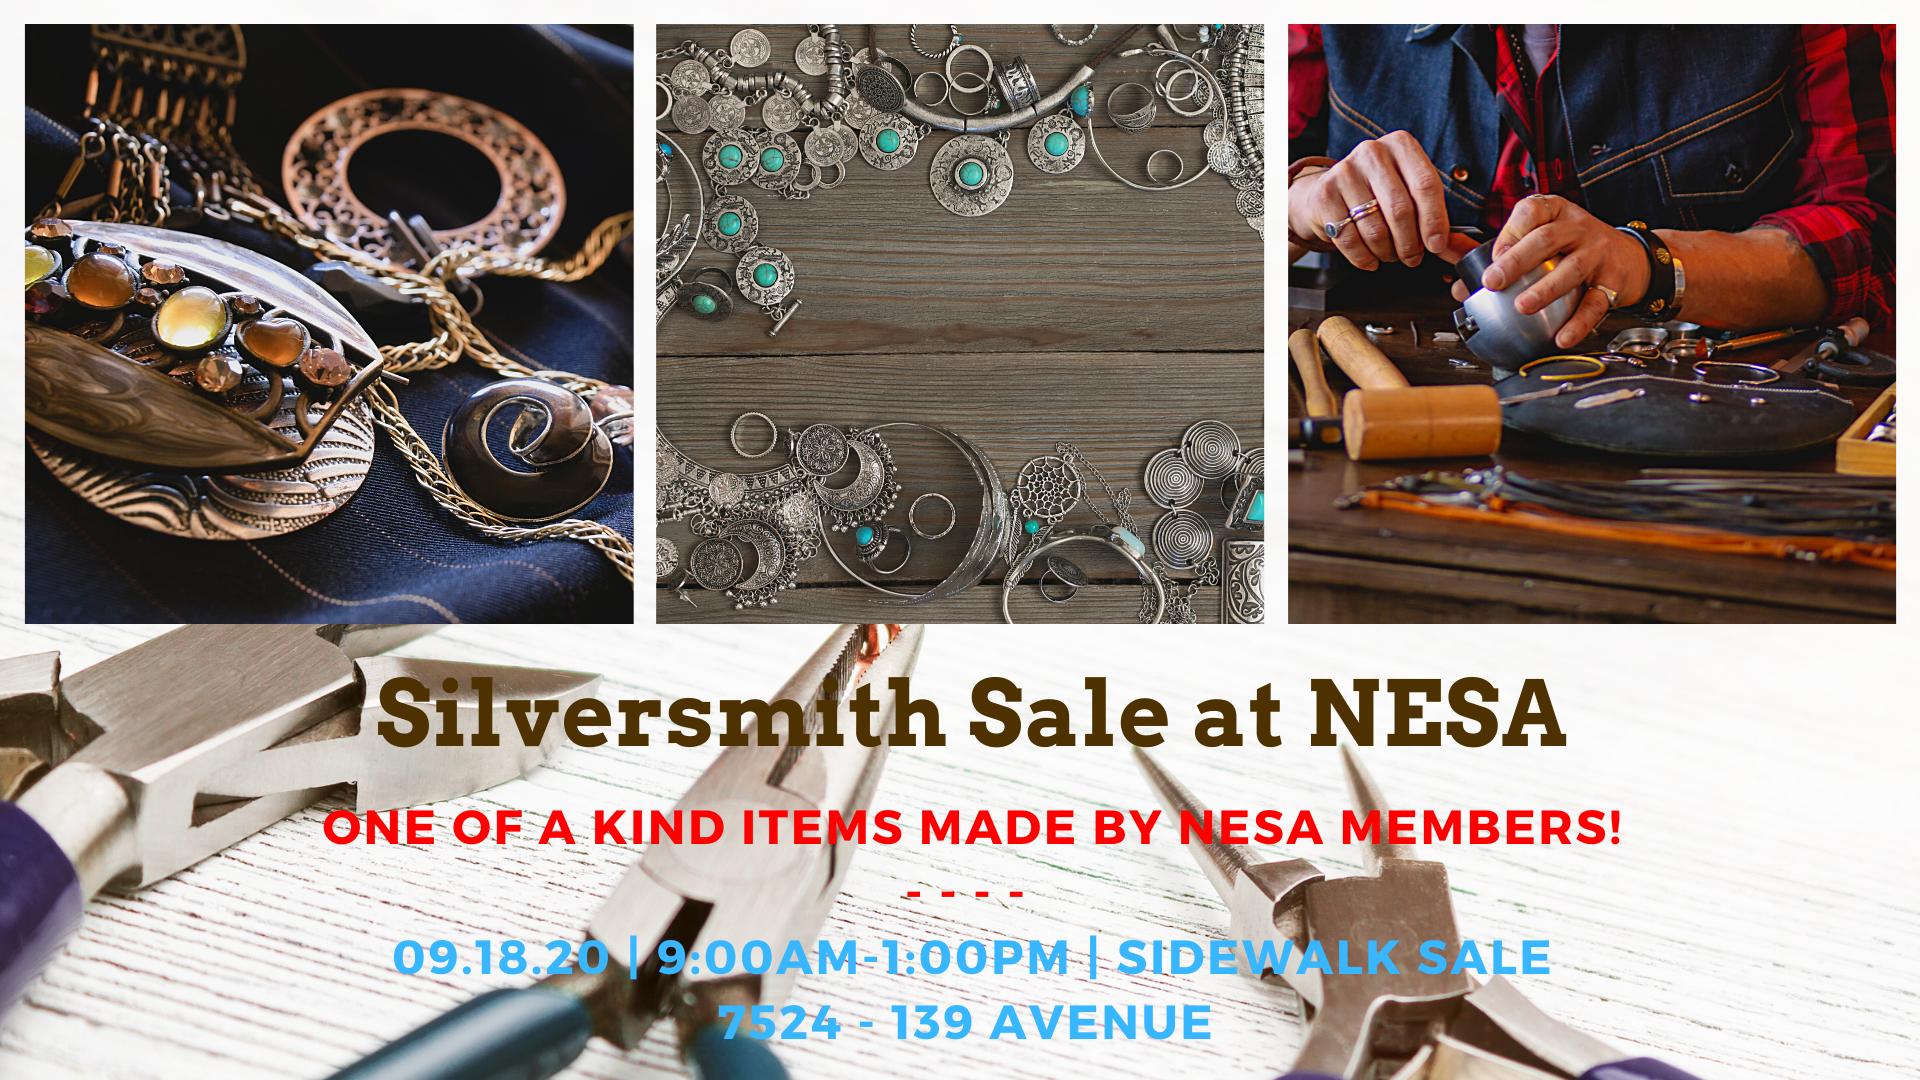 Silversmith Sale at NESA!